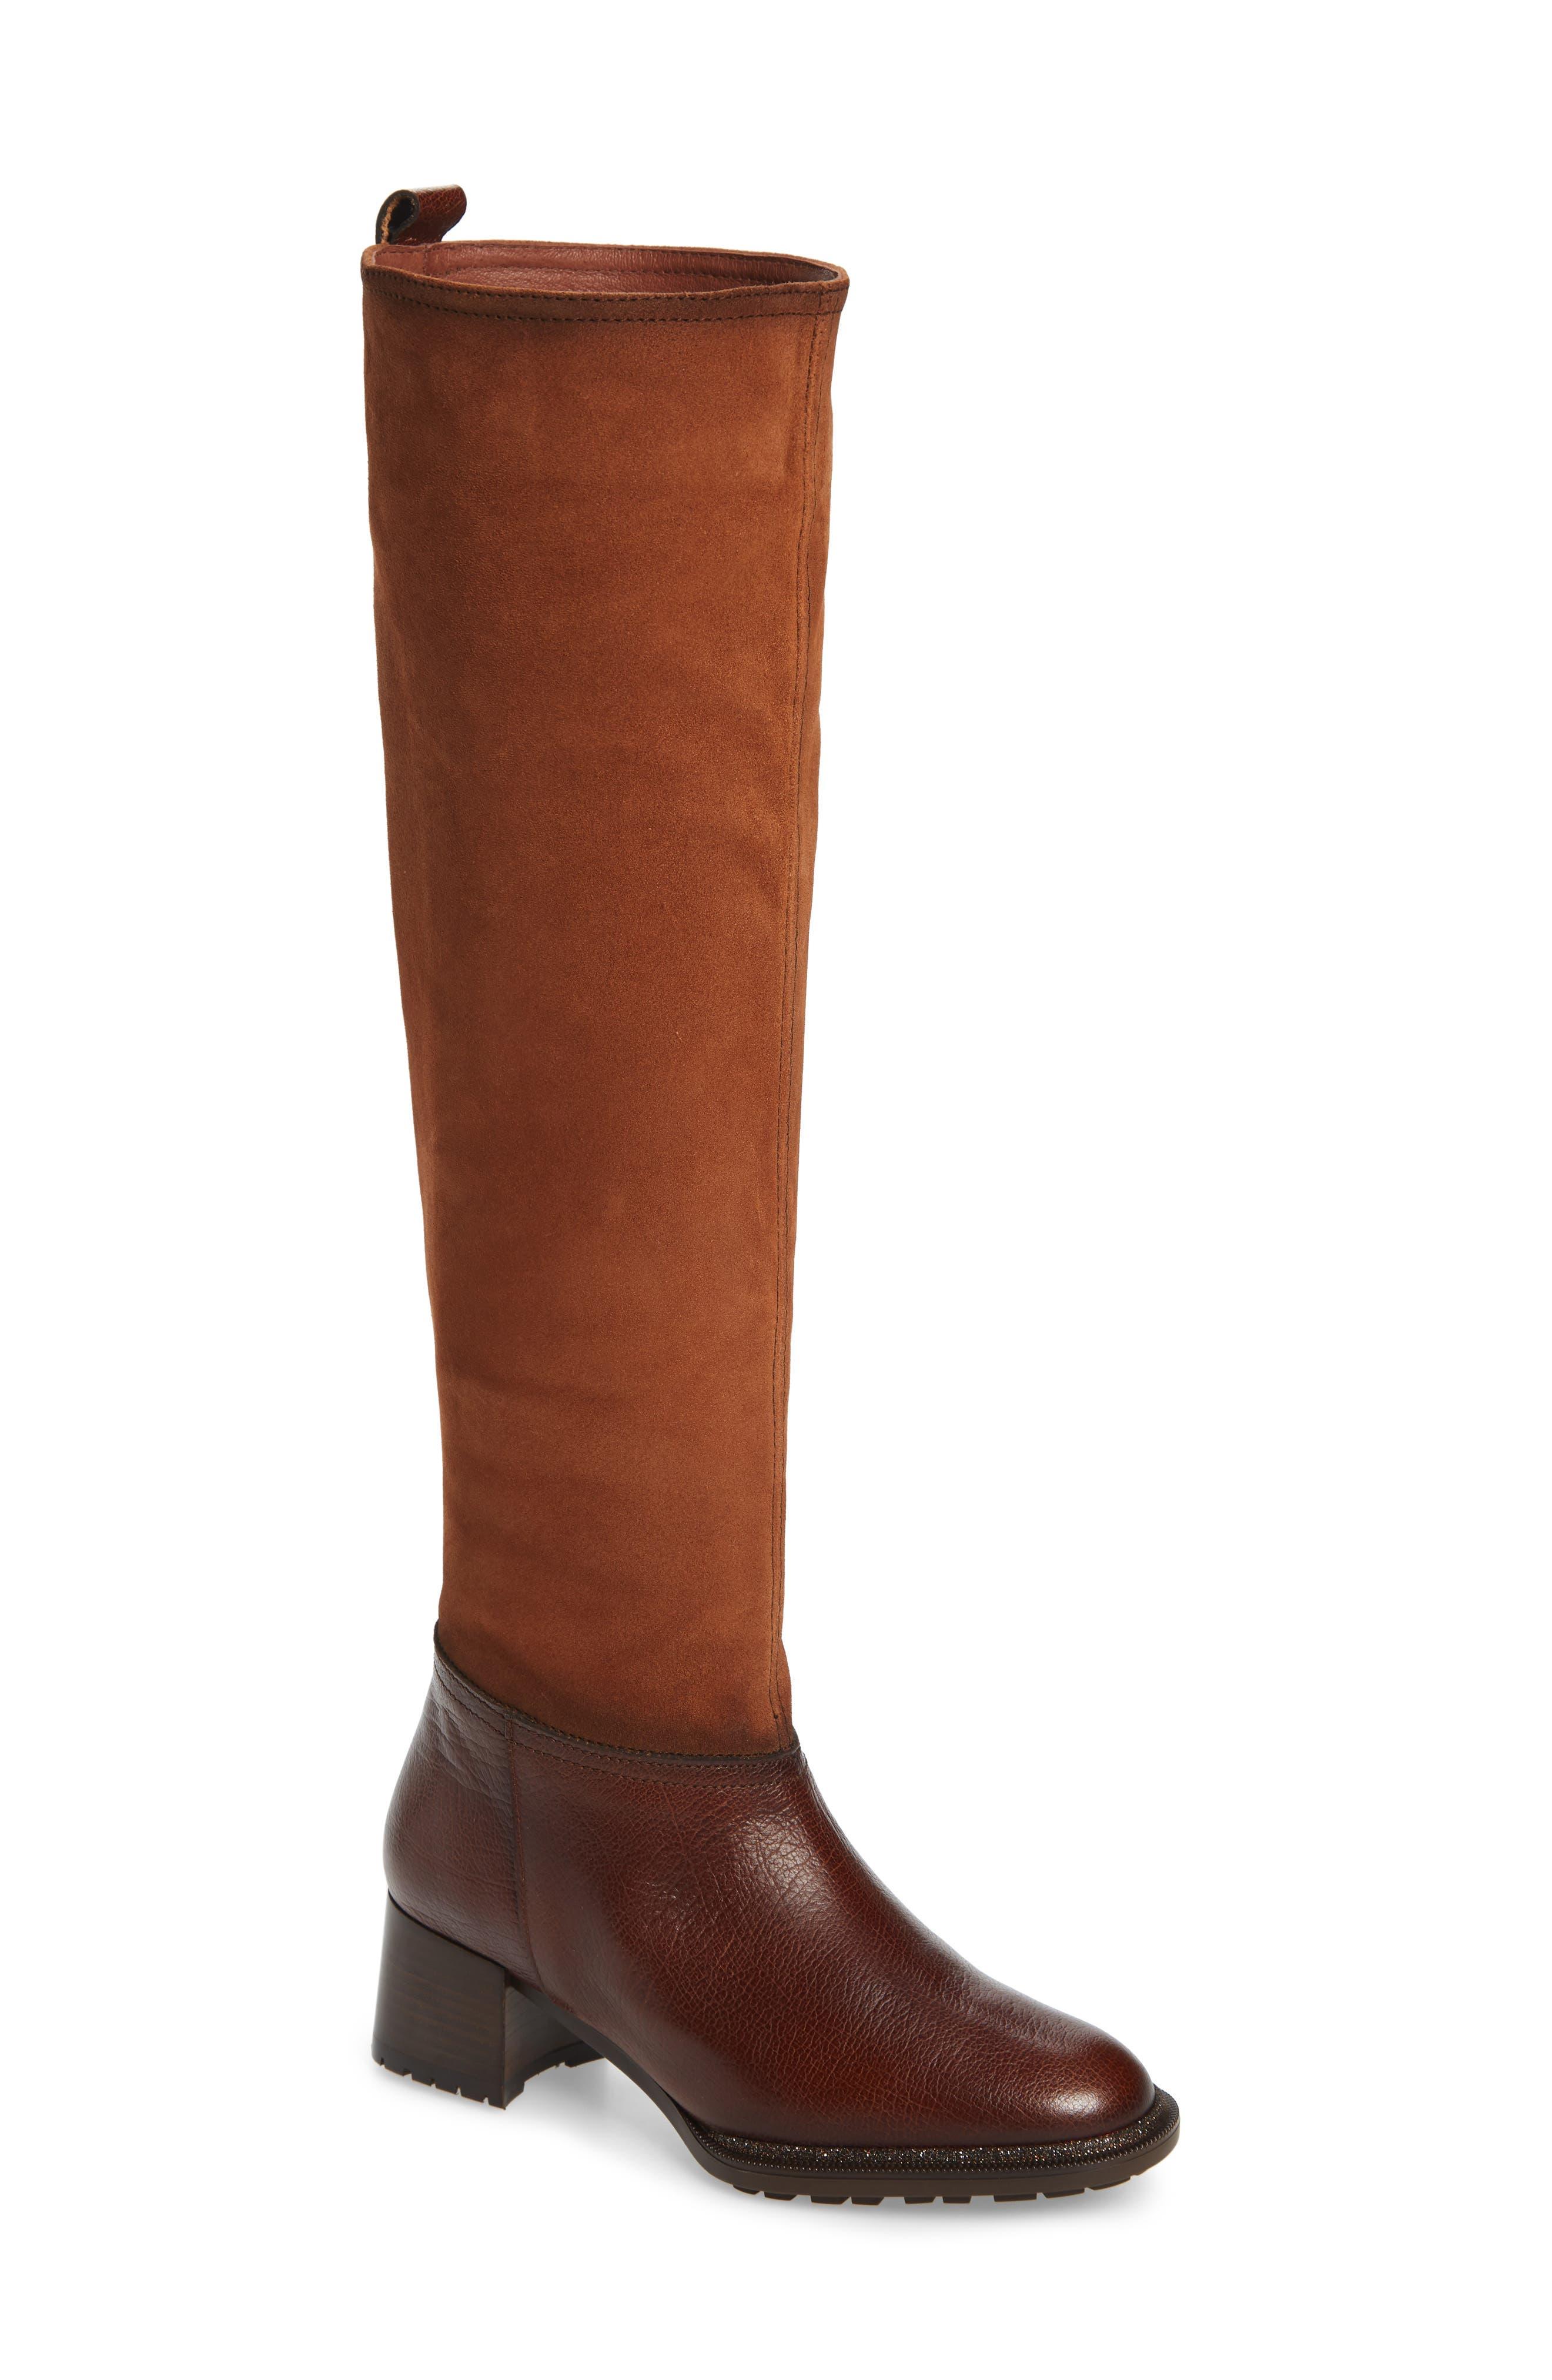 Hispanitas Pasha Over The Knee Boot